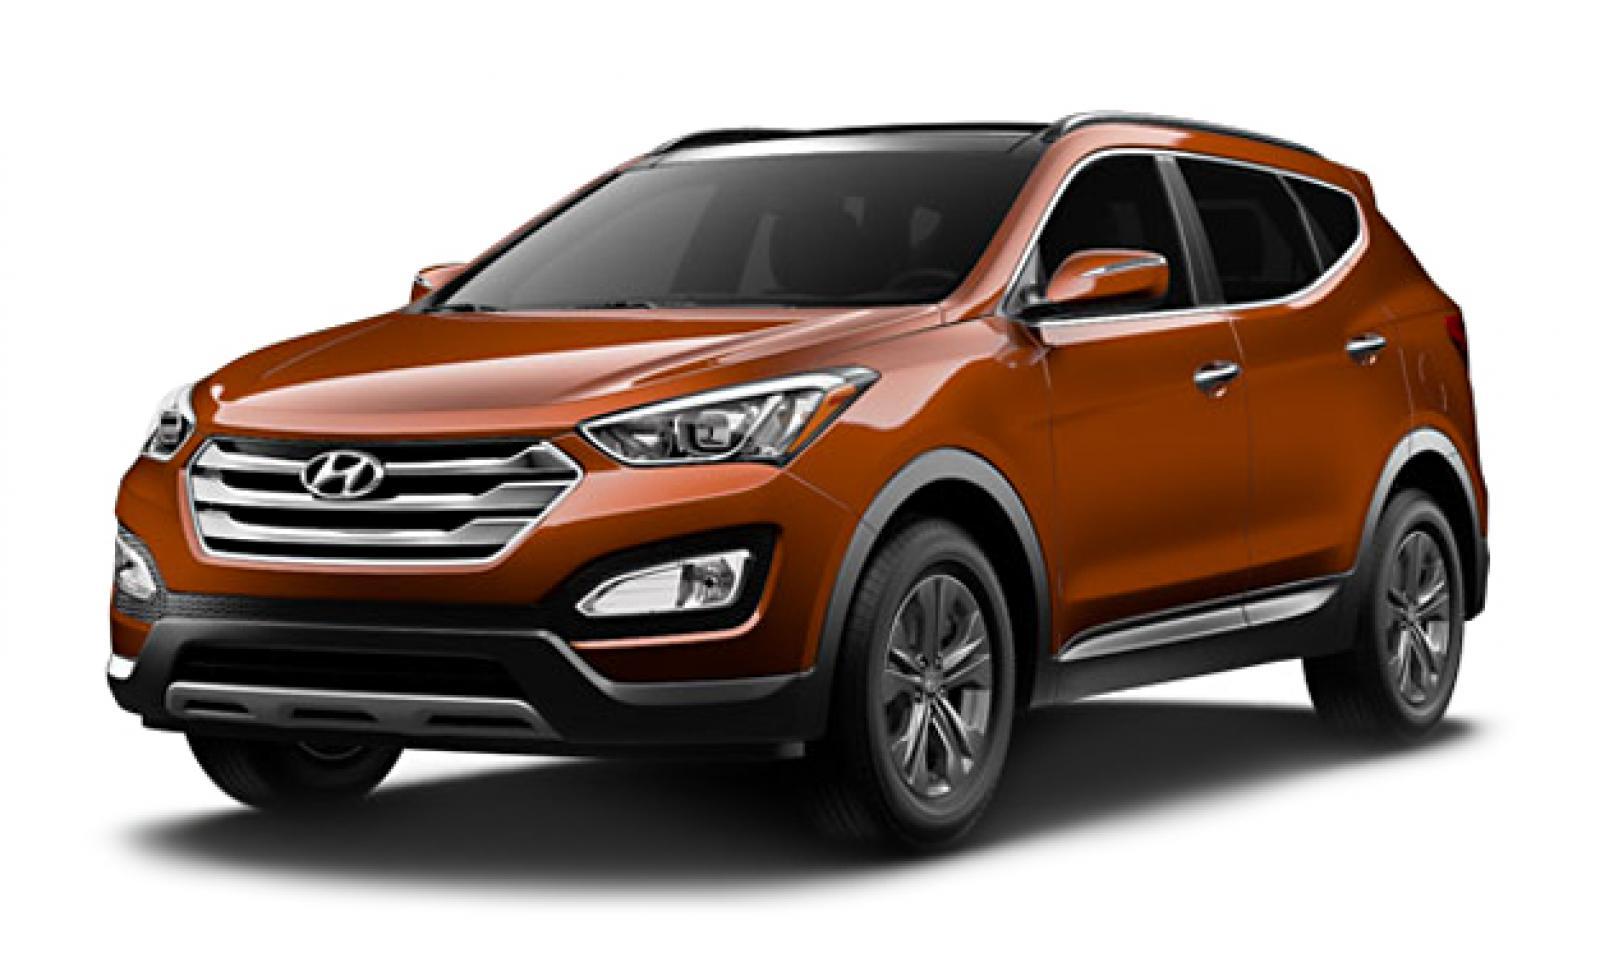 2015 Hyundai Santa Fe Sport Information And Photos